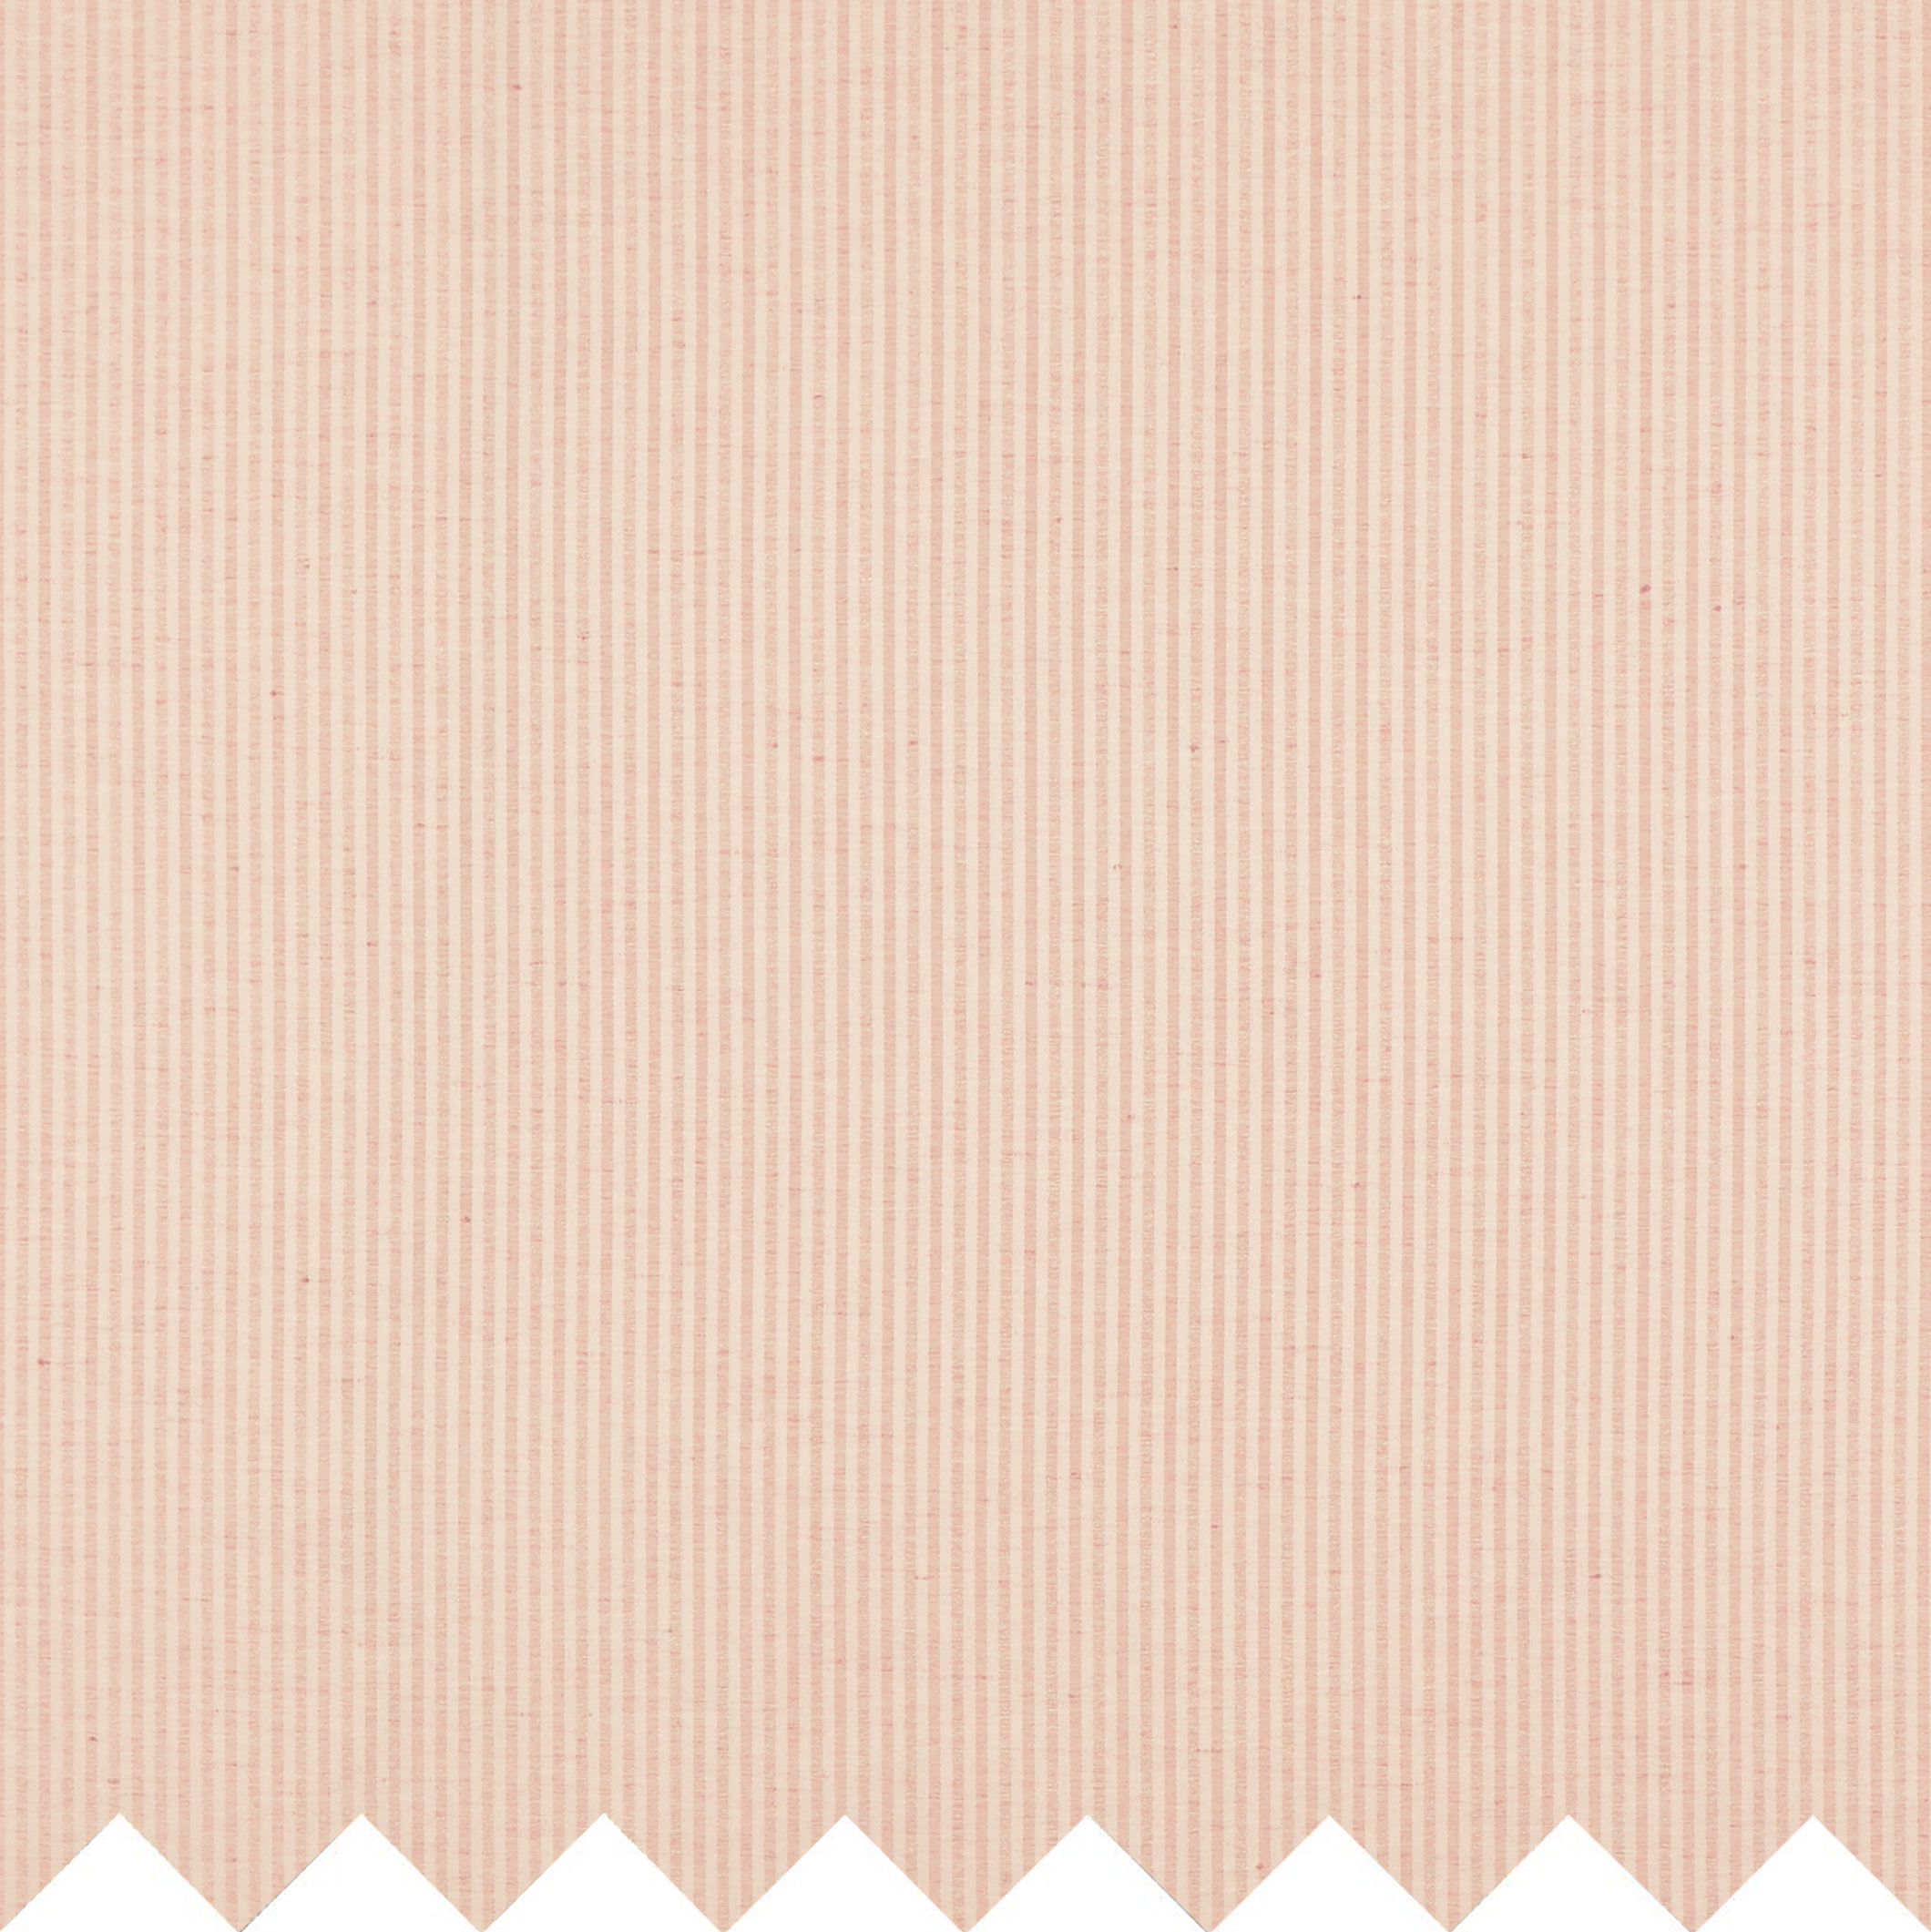 satomi-blush-swatch.jpg